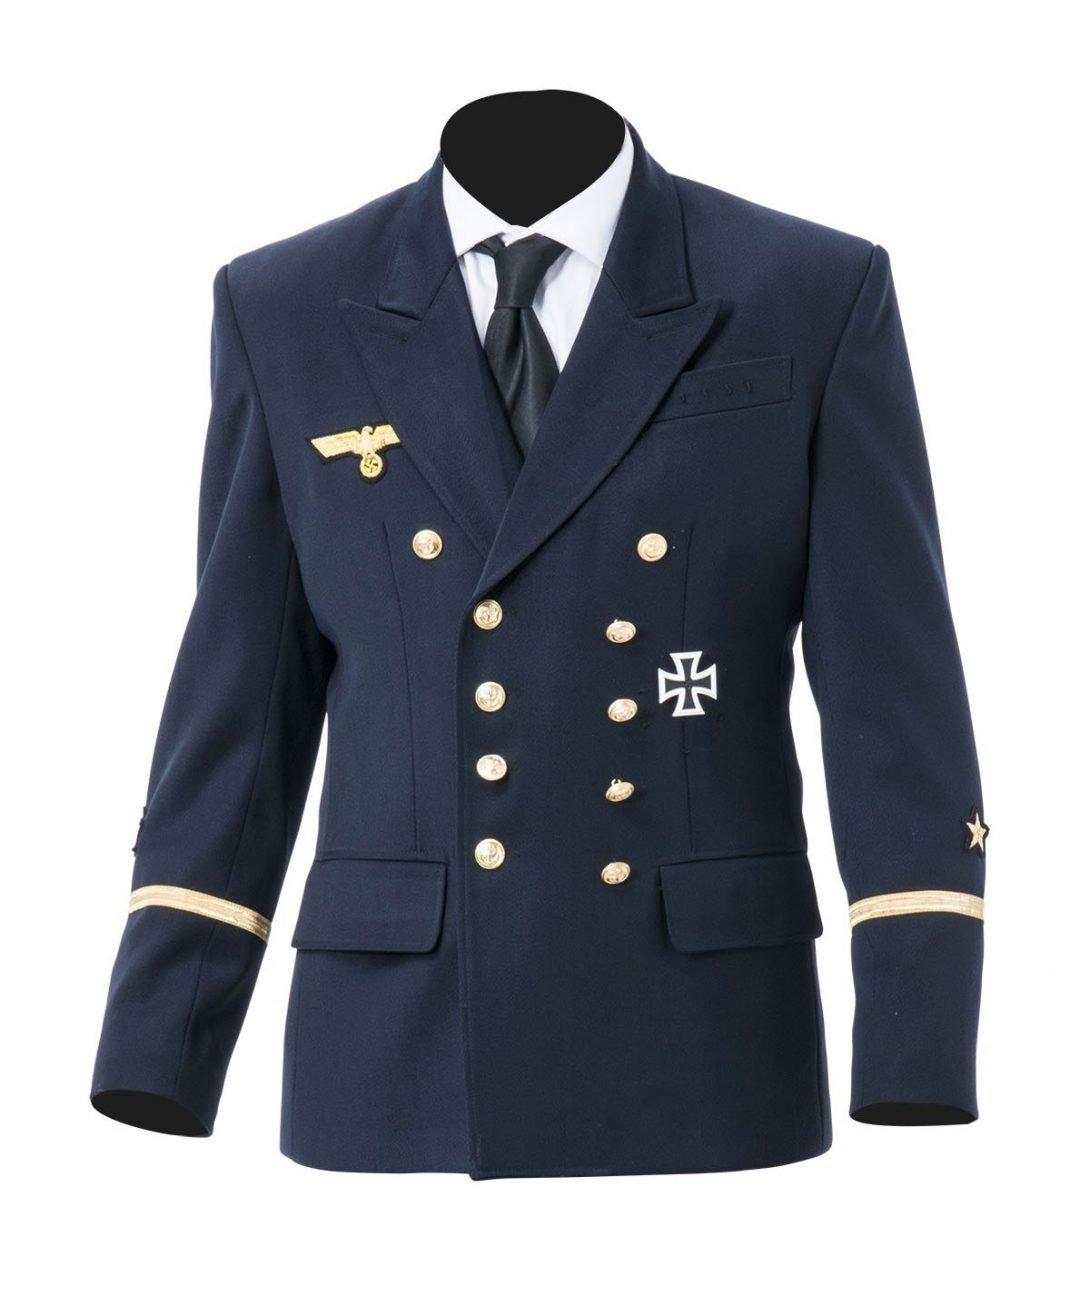 WW2 German Kriegsmarine officers tunic